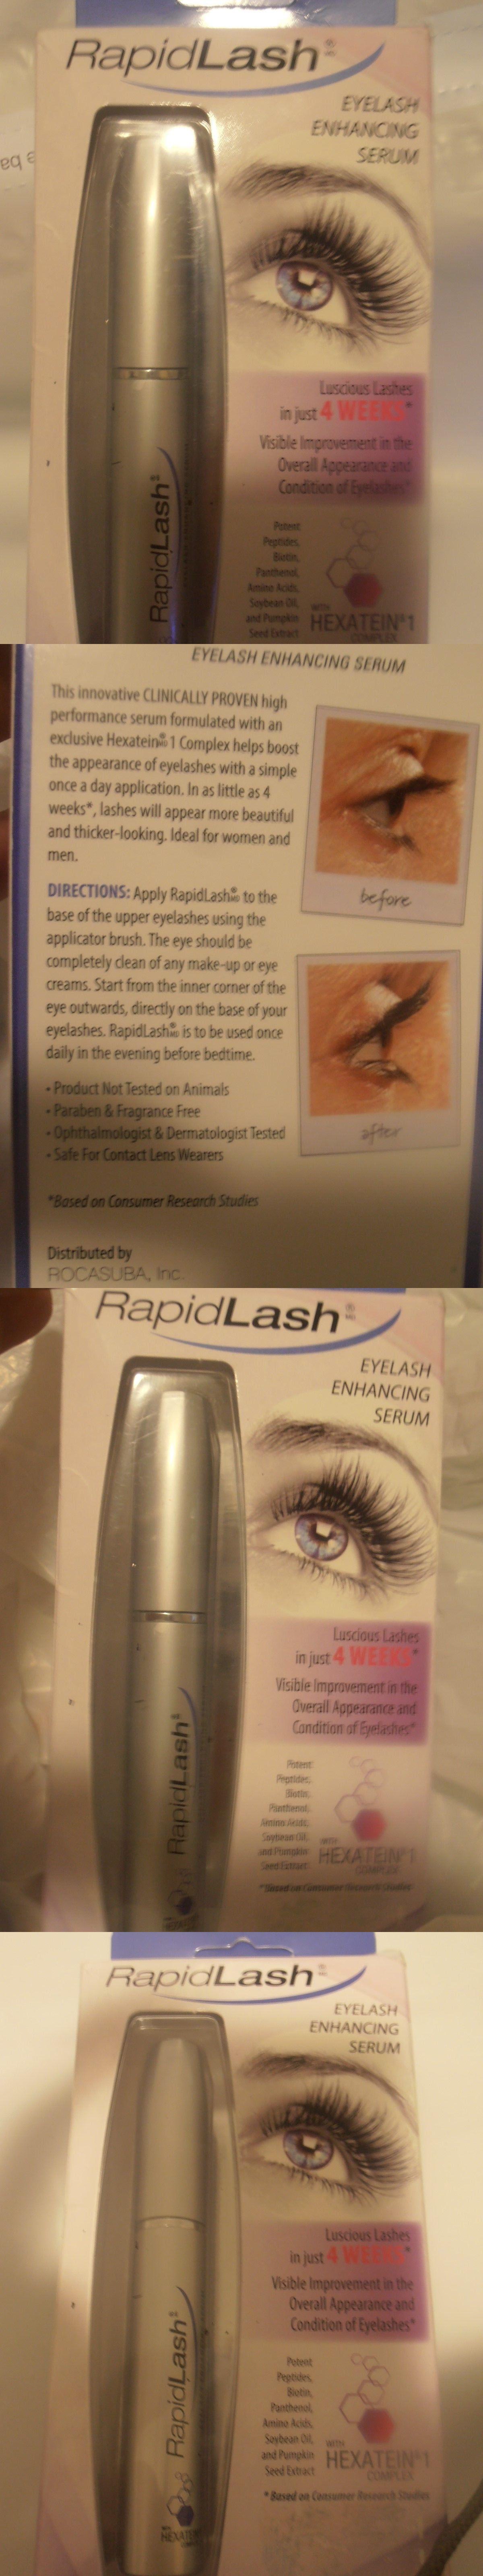 Rapidlash Eyelash Enhancing Serum Lash Growth And Conditioner